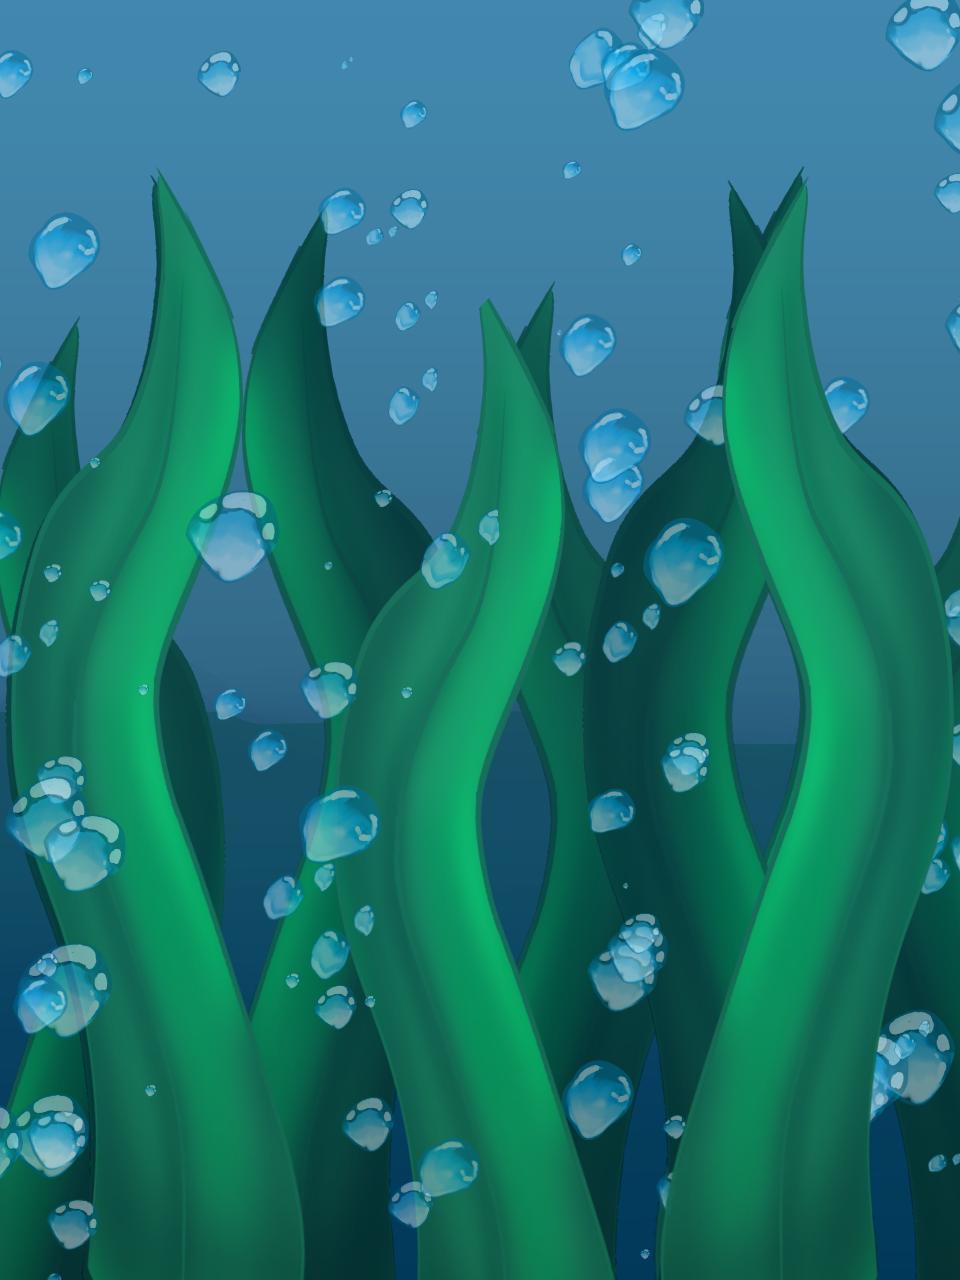 Bajo el agua :v Illust of SteveSanzR2 medibangpaint